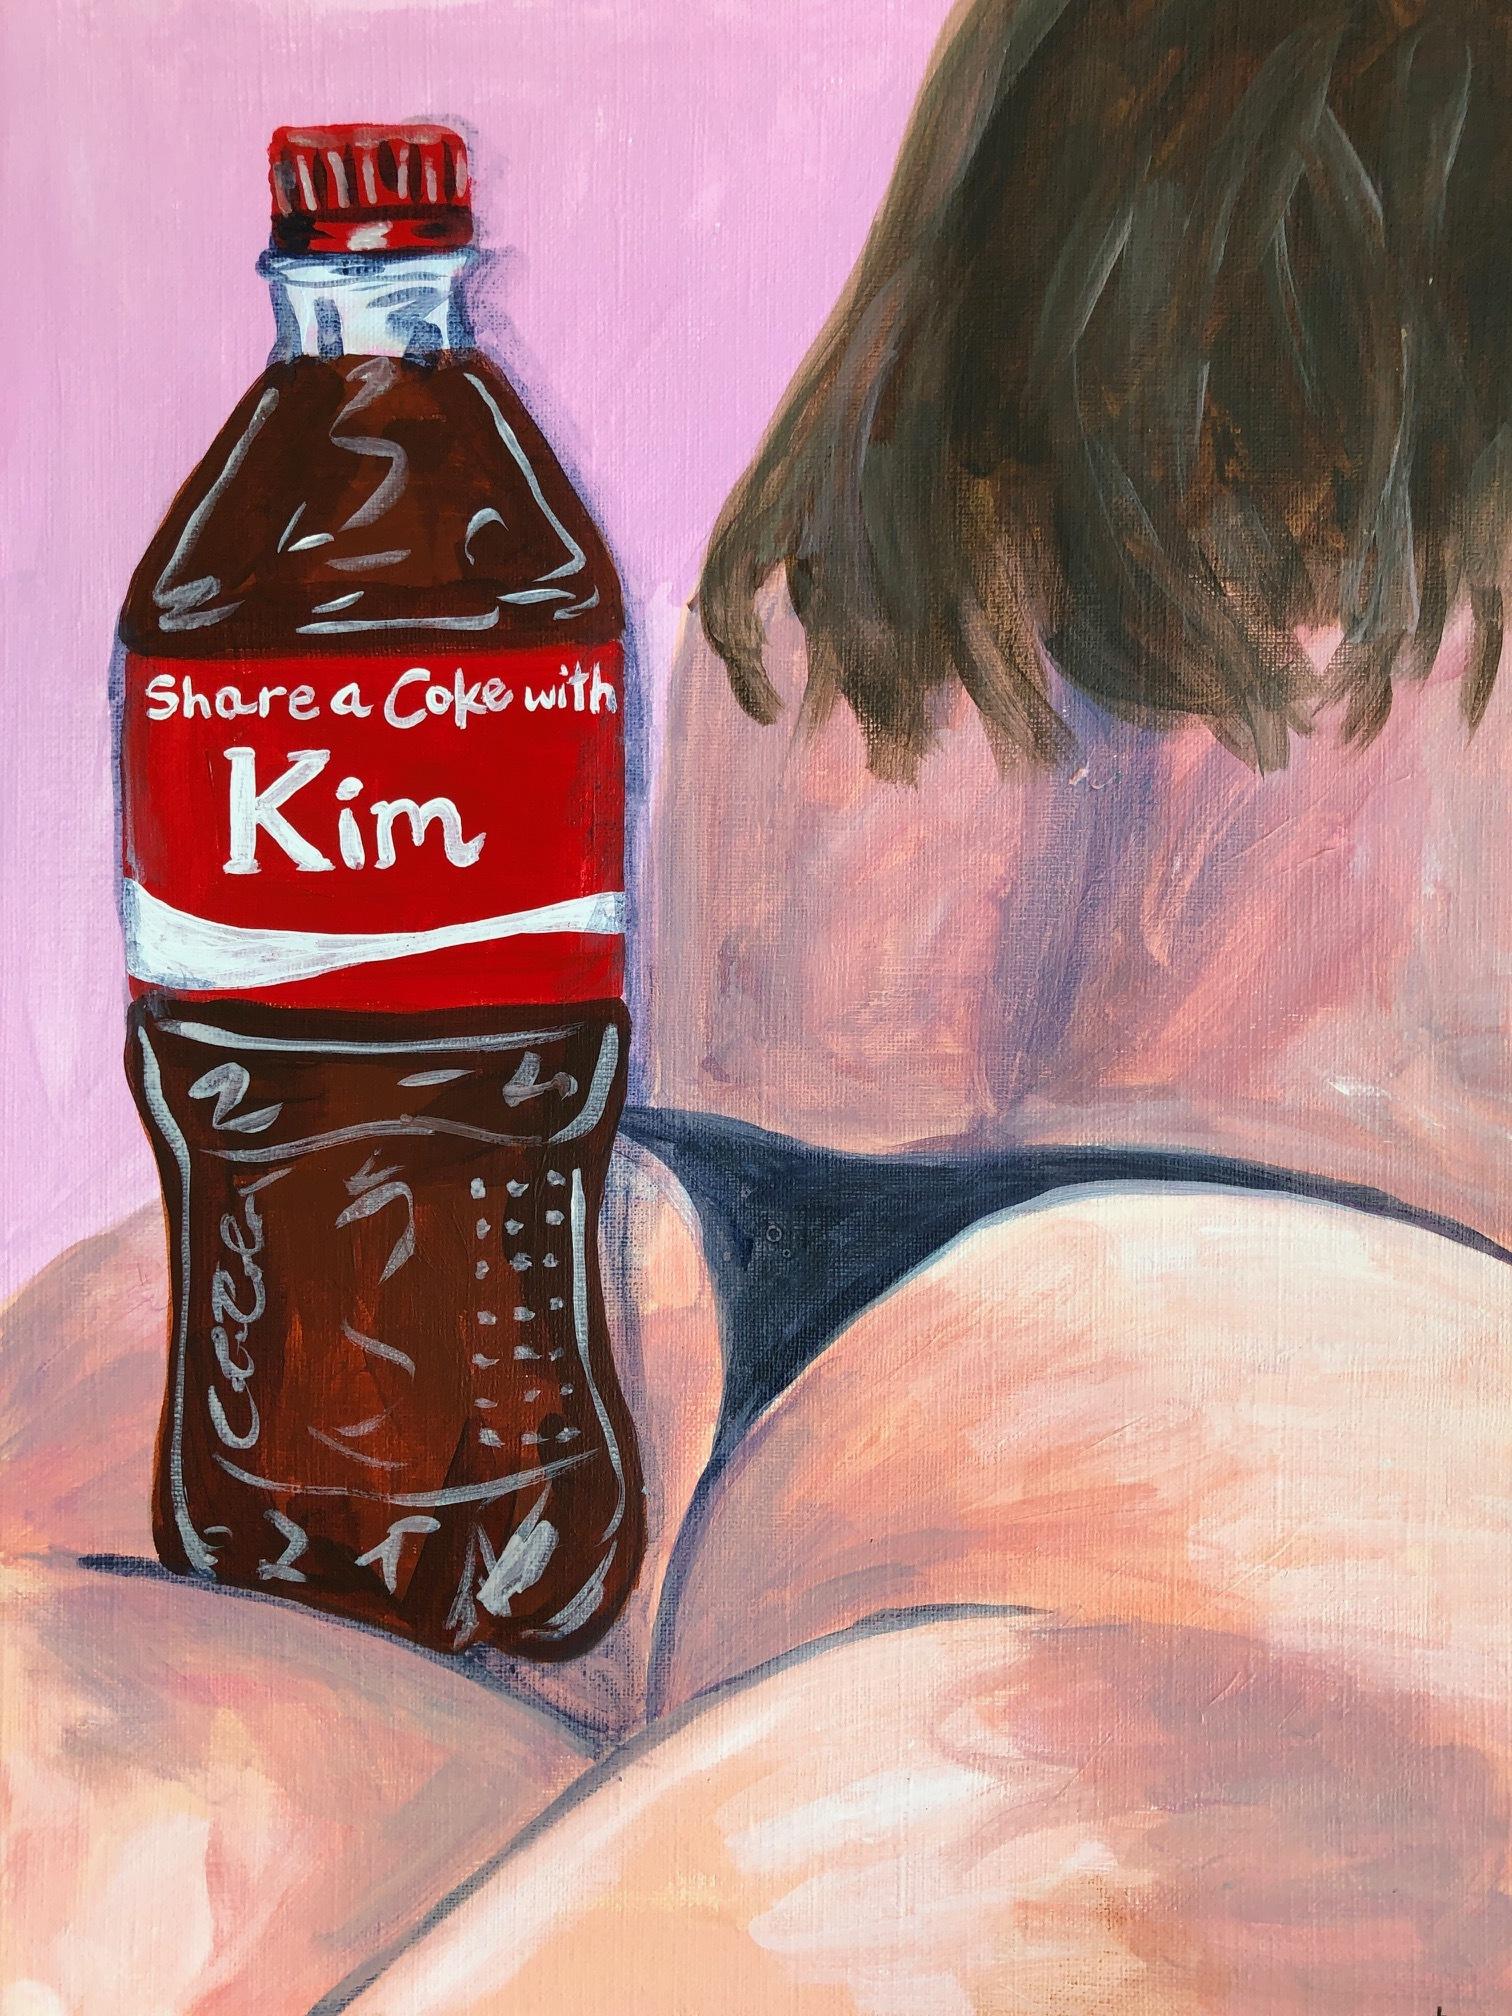 Kim's Coke